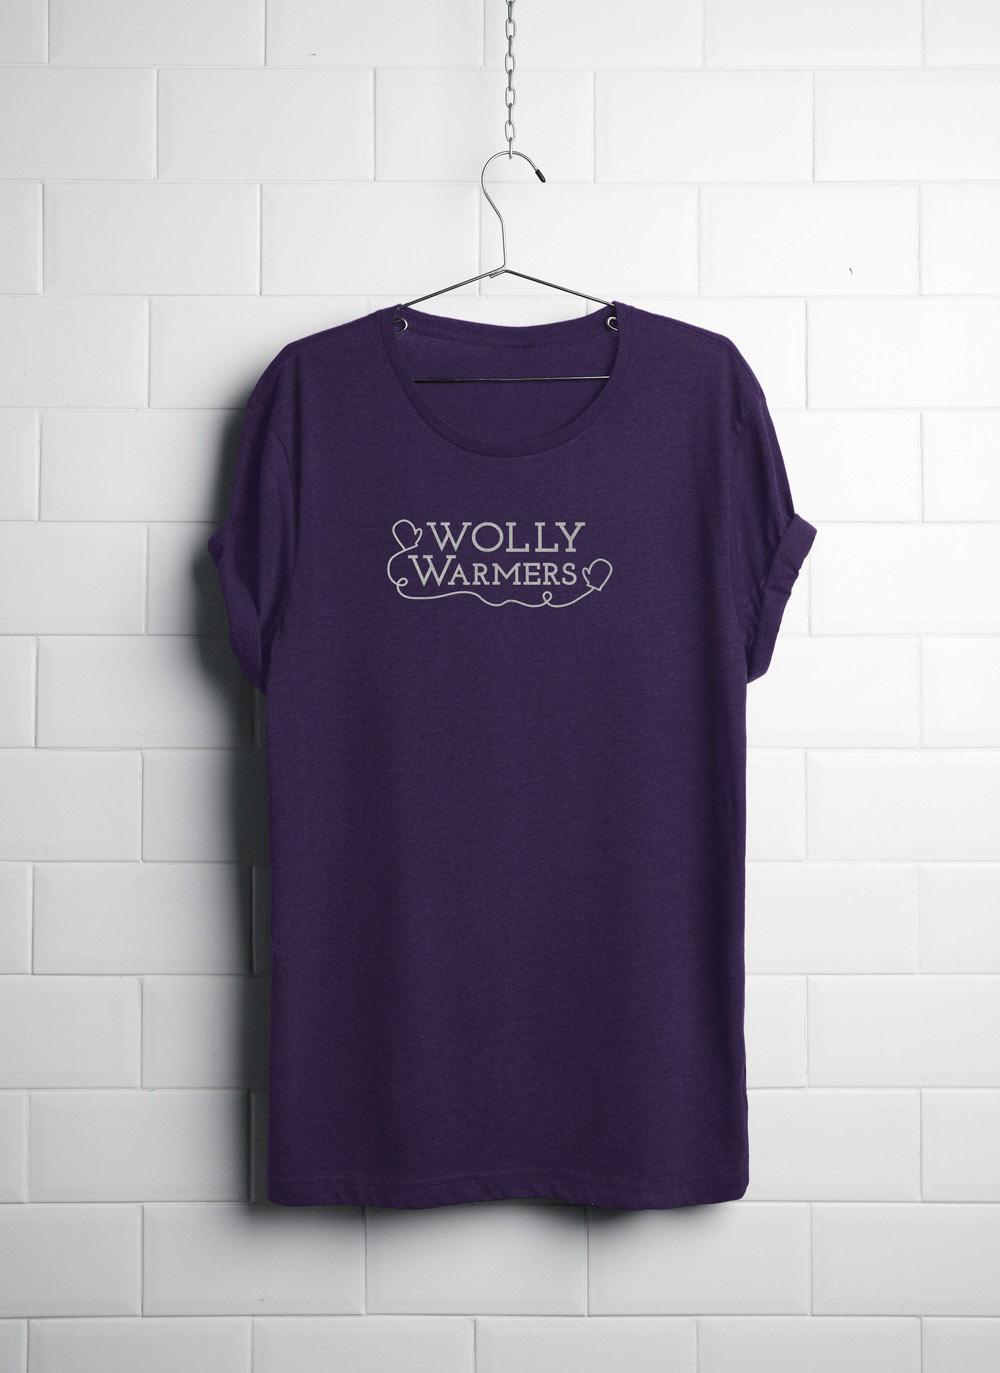 Wolly+T-shirt+PSD.jpg